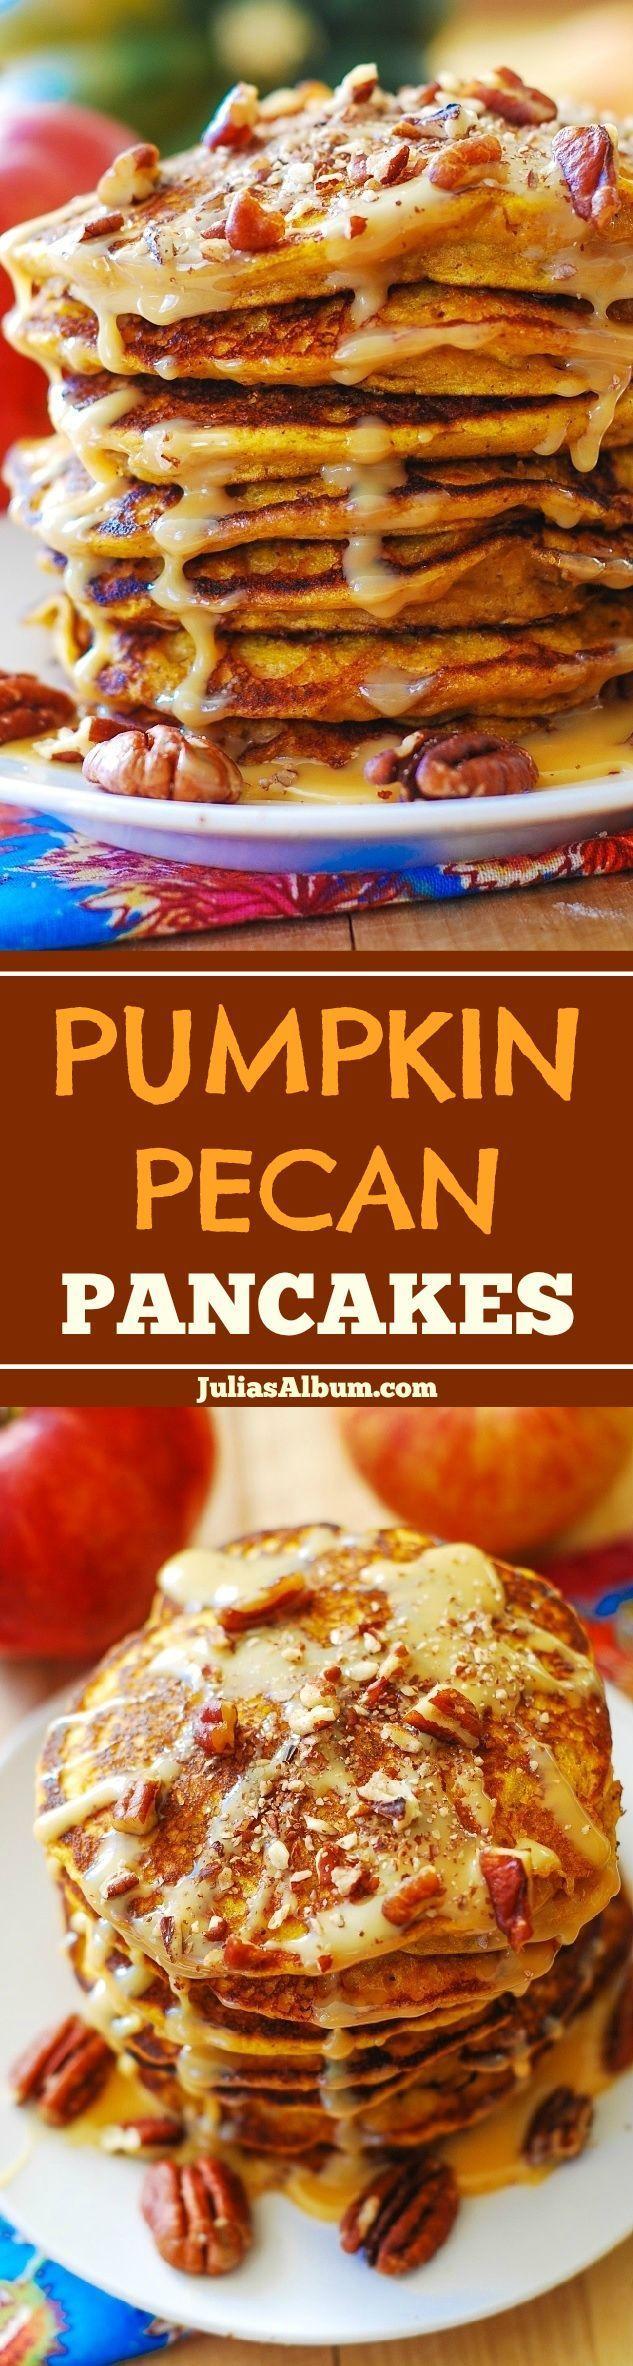 Pumpkin-Pecan Pancakes with Pecan Sauce #Thanksgiving #Fall #Holidays #breakfast via @juliasalbum/ (Apple Recipes Breakfast)